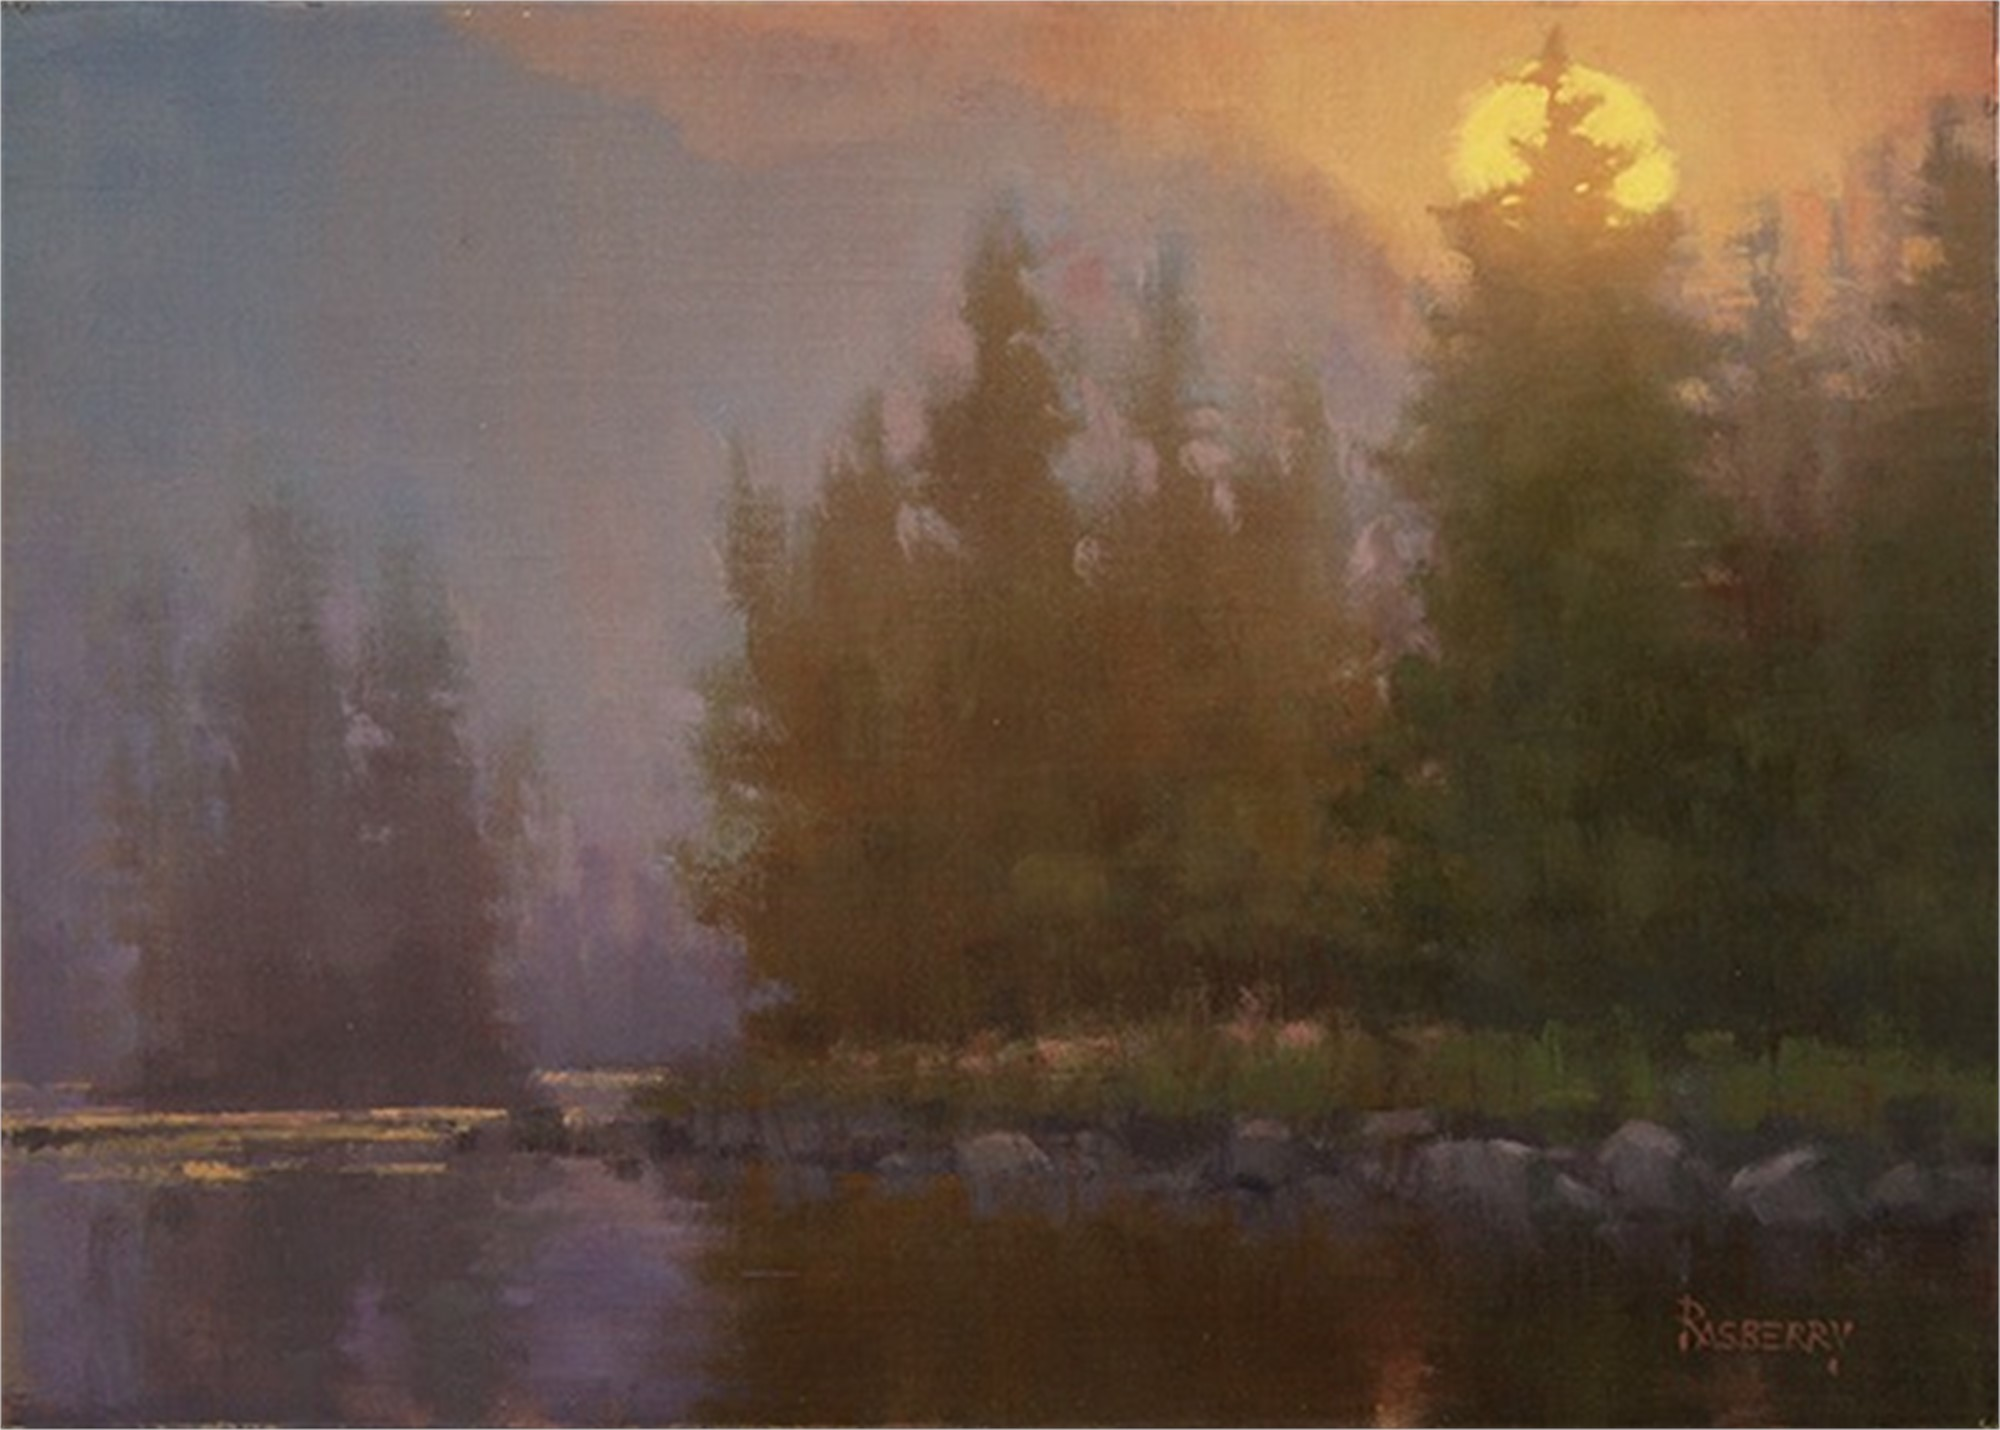 Sunrise through the Fog by John Rasberry